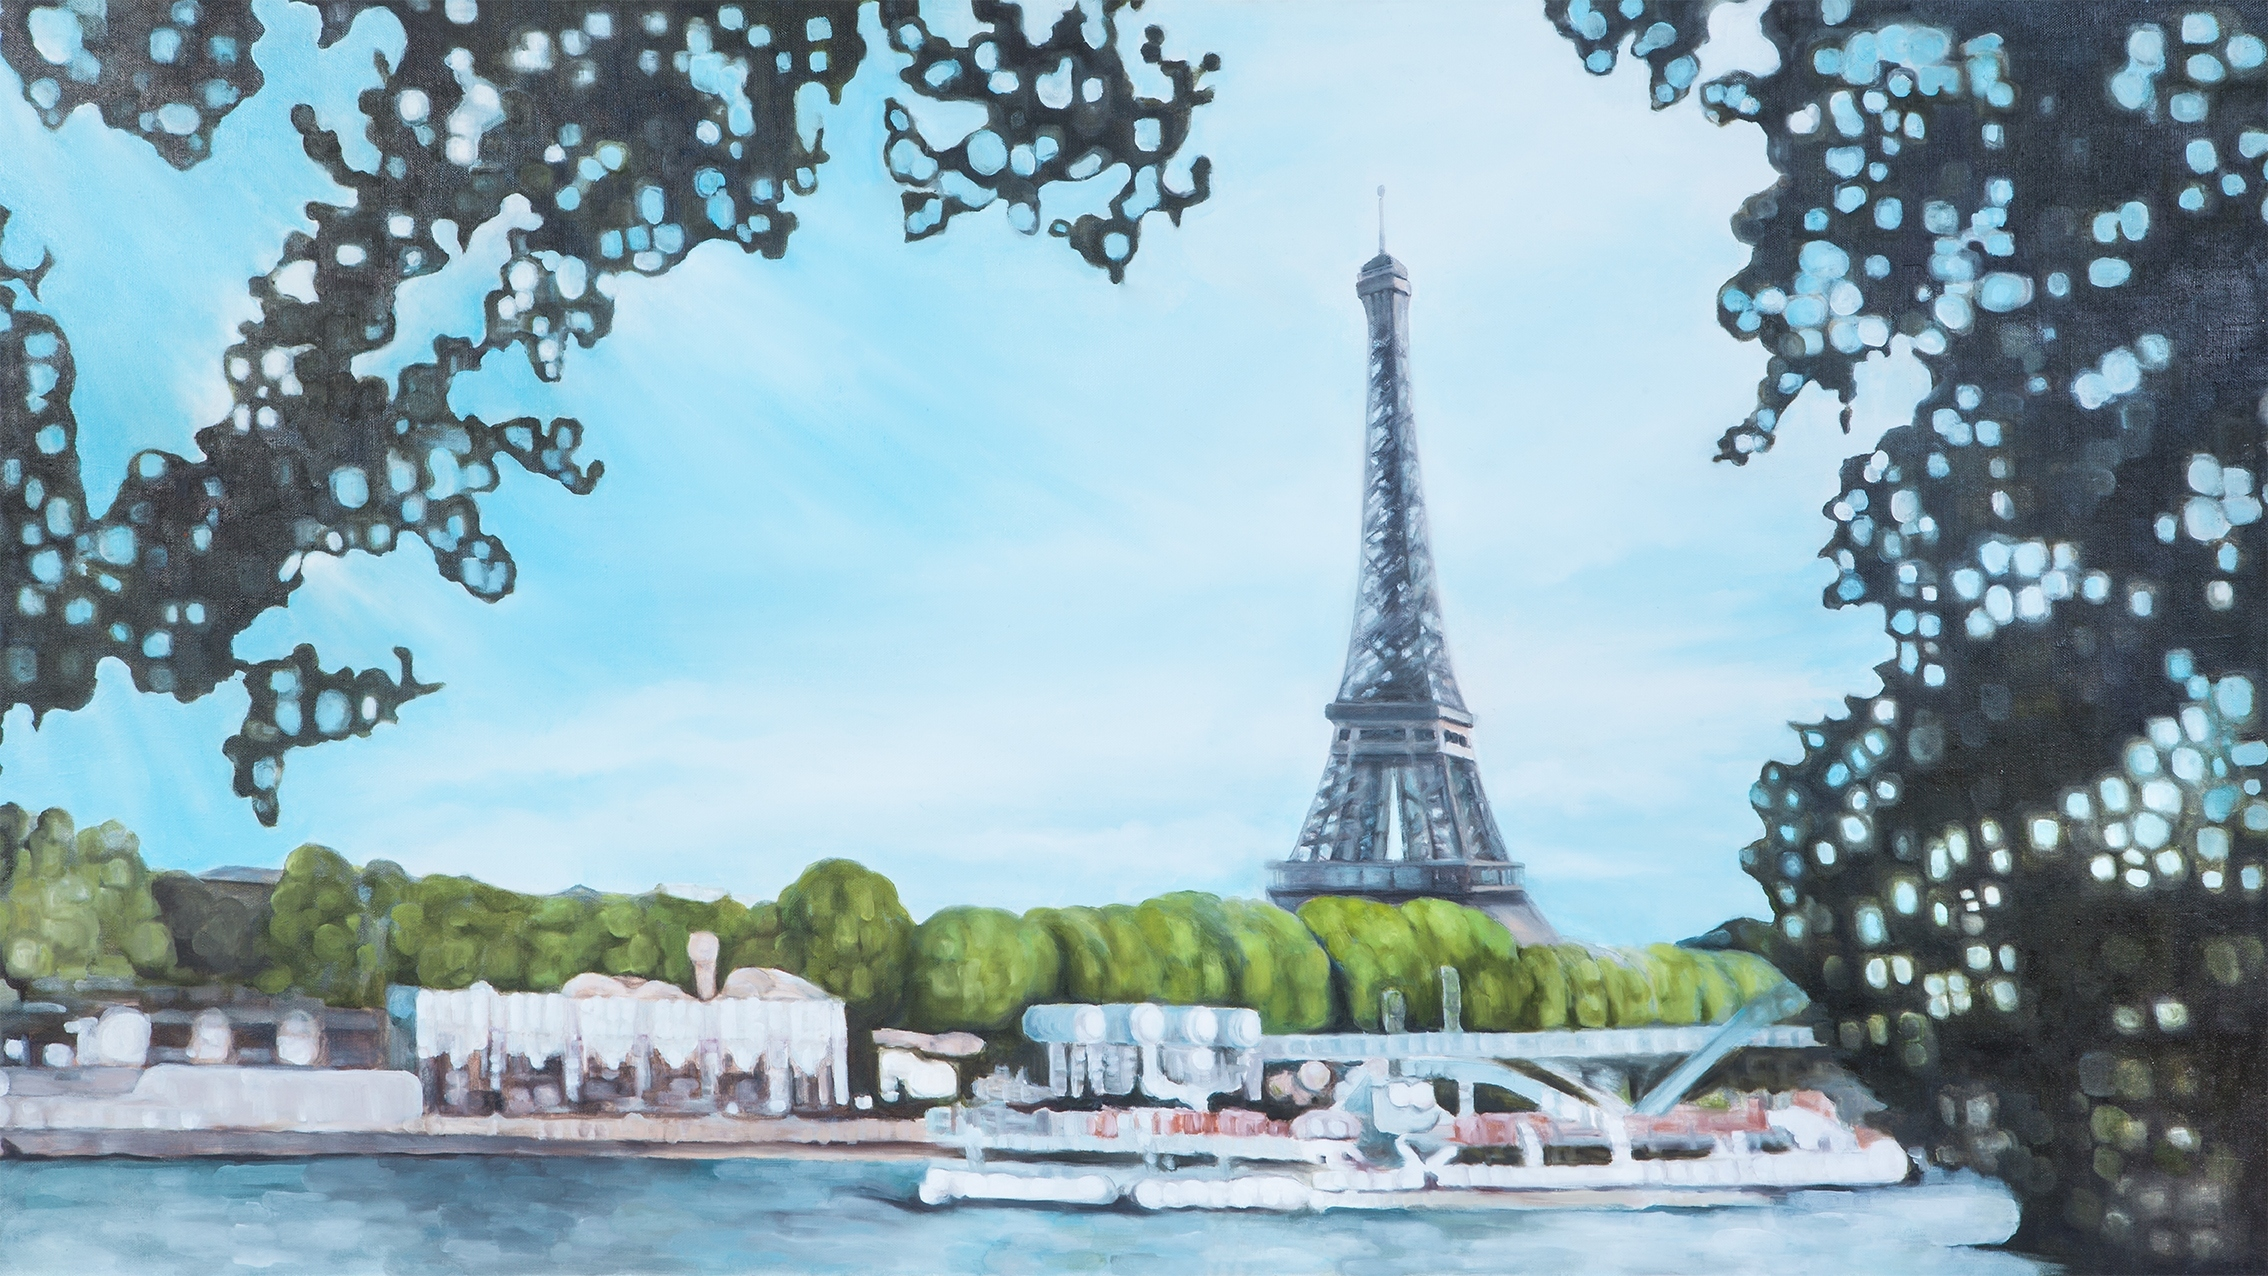 The sounds of Paris articcio